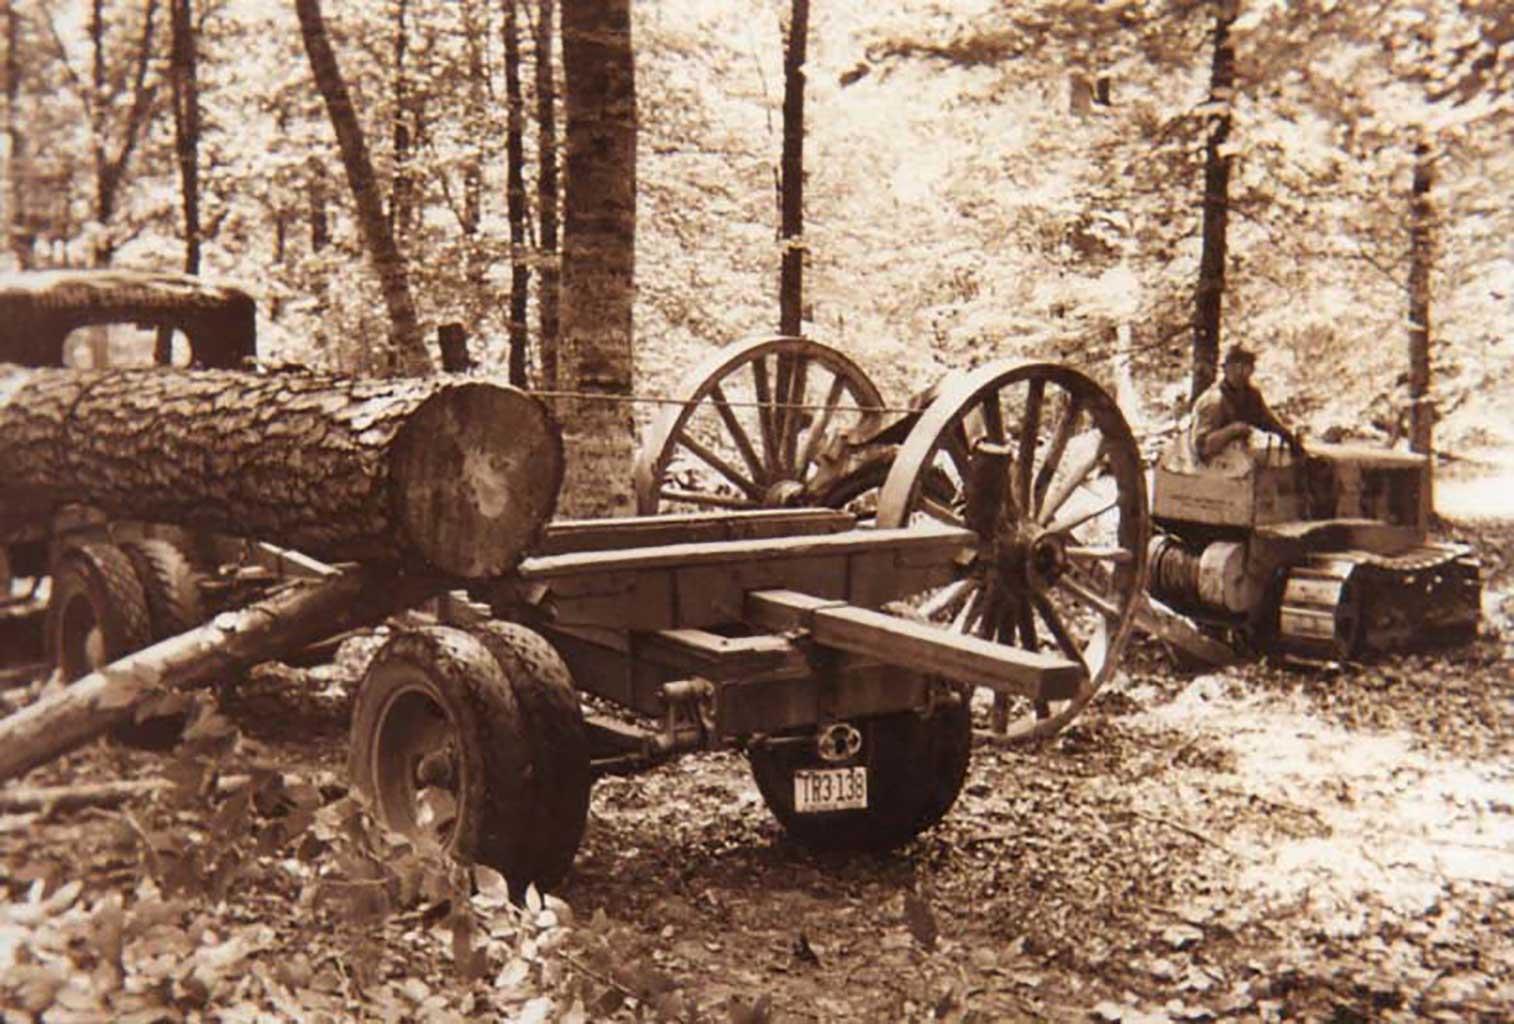 klc-big-boy-doughty-logging-with-cat-22-1938-img265